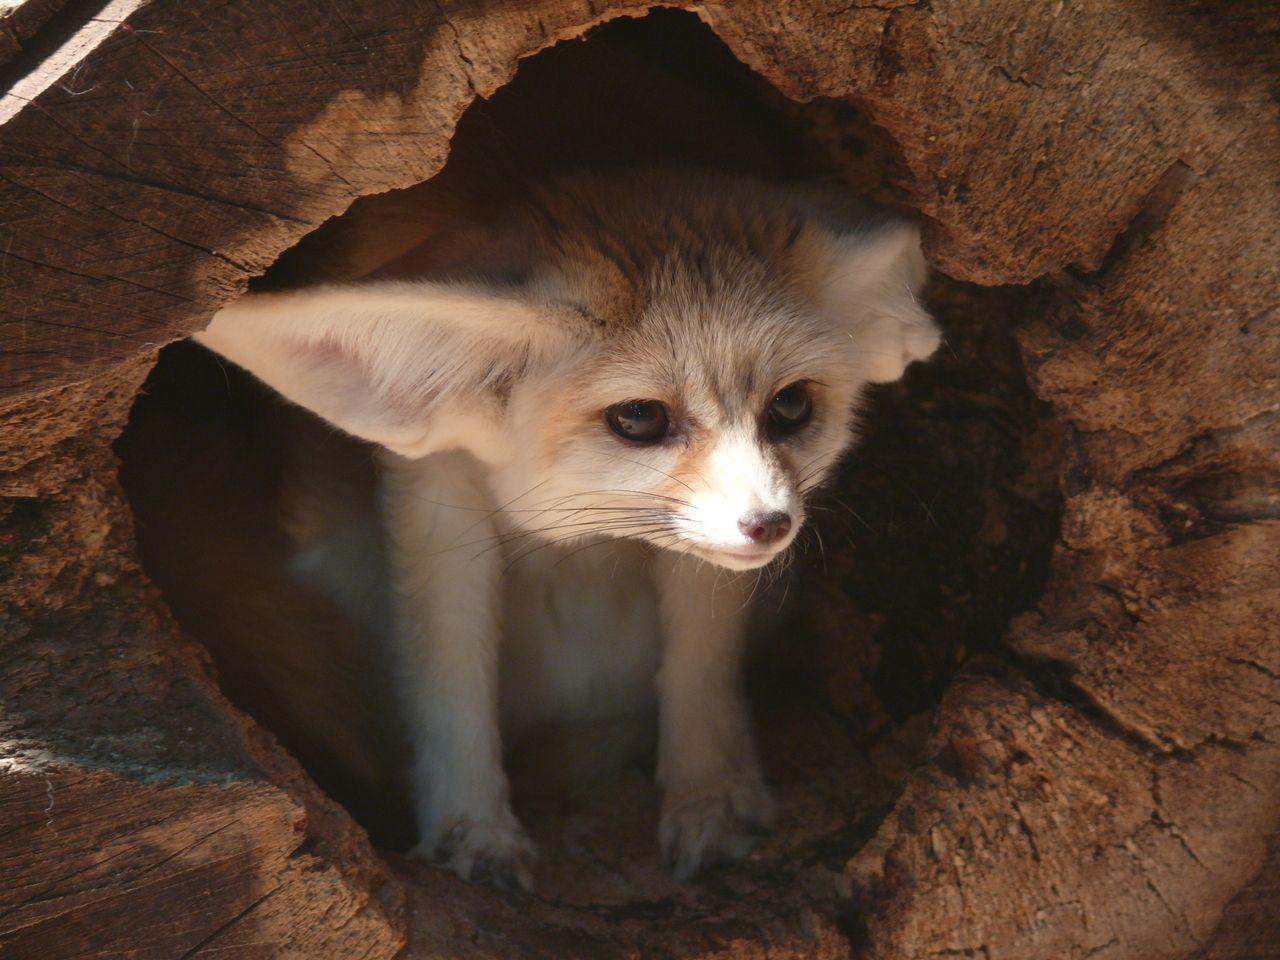 I Wander Why I Hear So Good Susse Tiere Fennek Fennek Fuchs